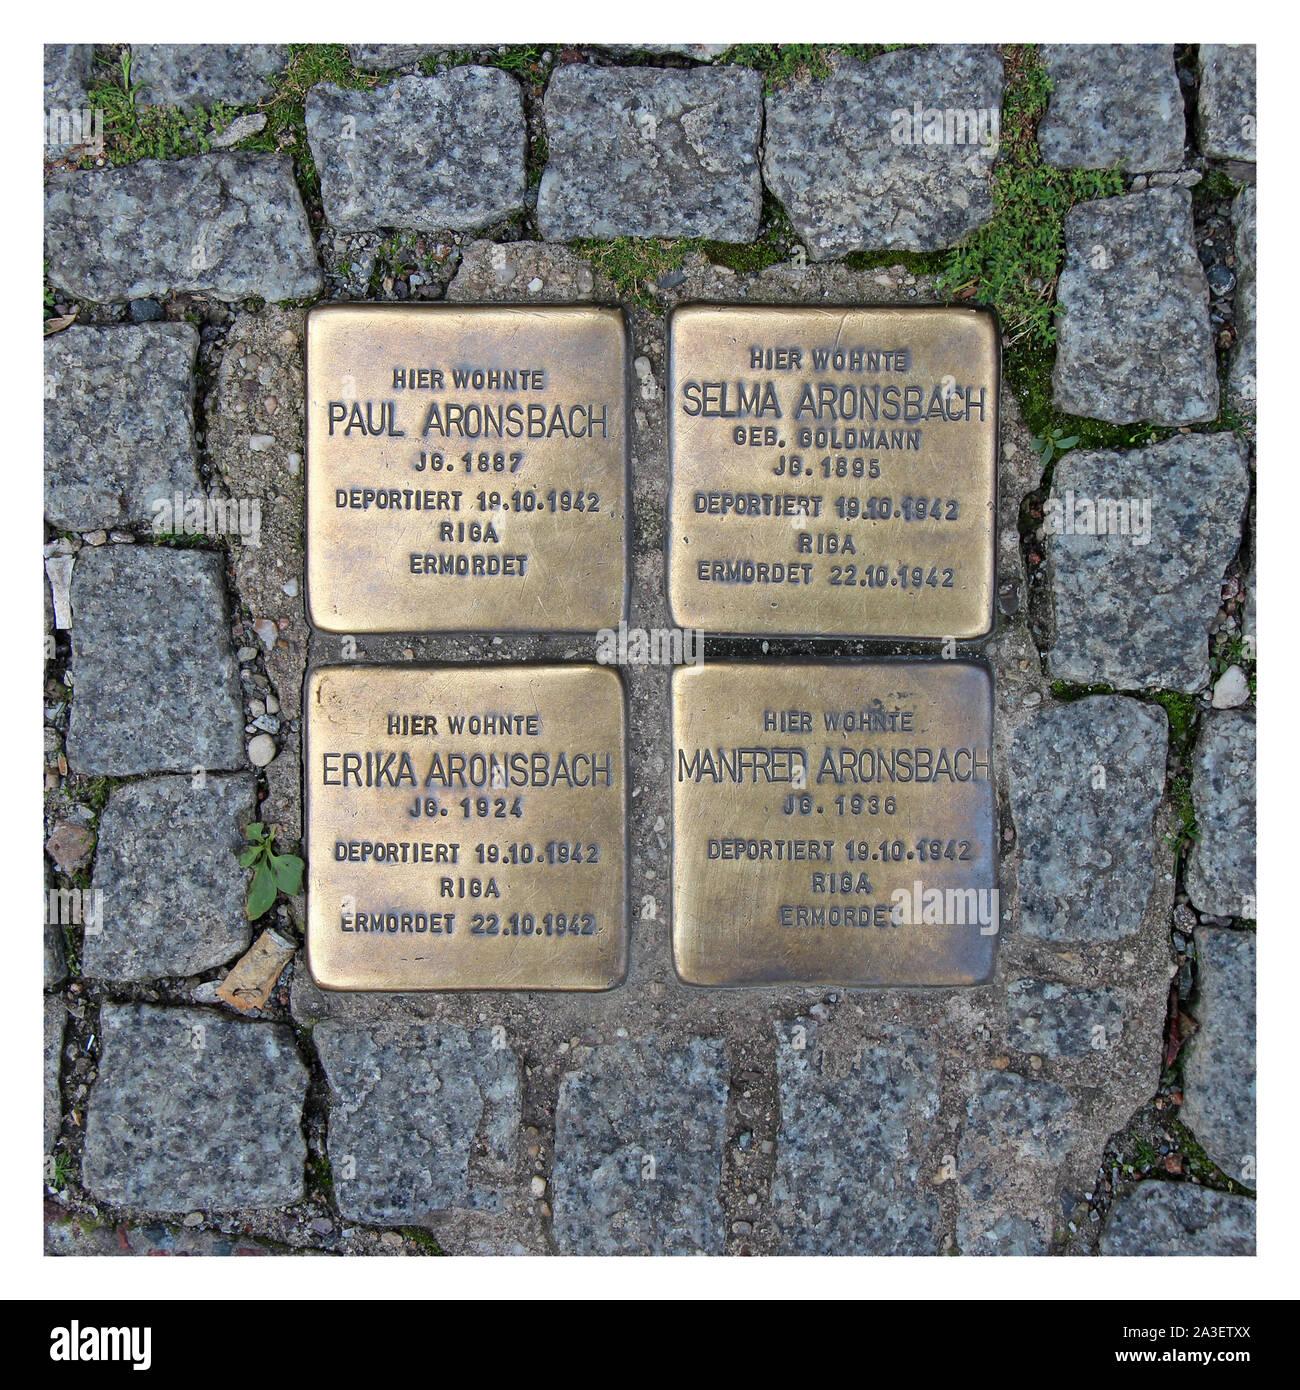 Pavimento en Berlín (Alemania) Foto de stock